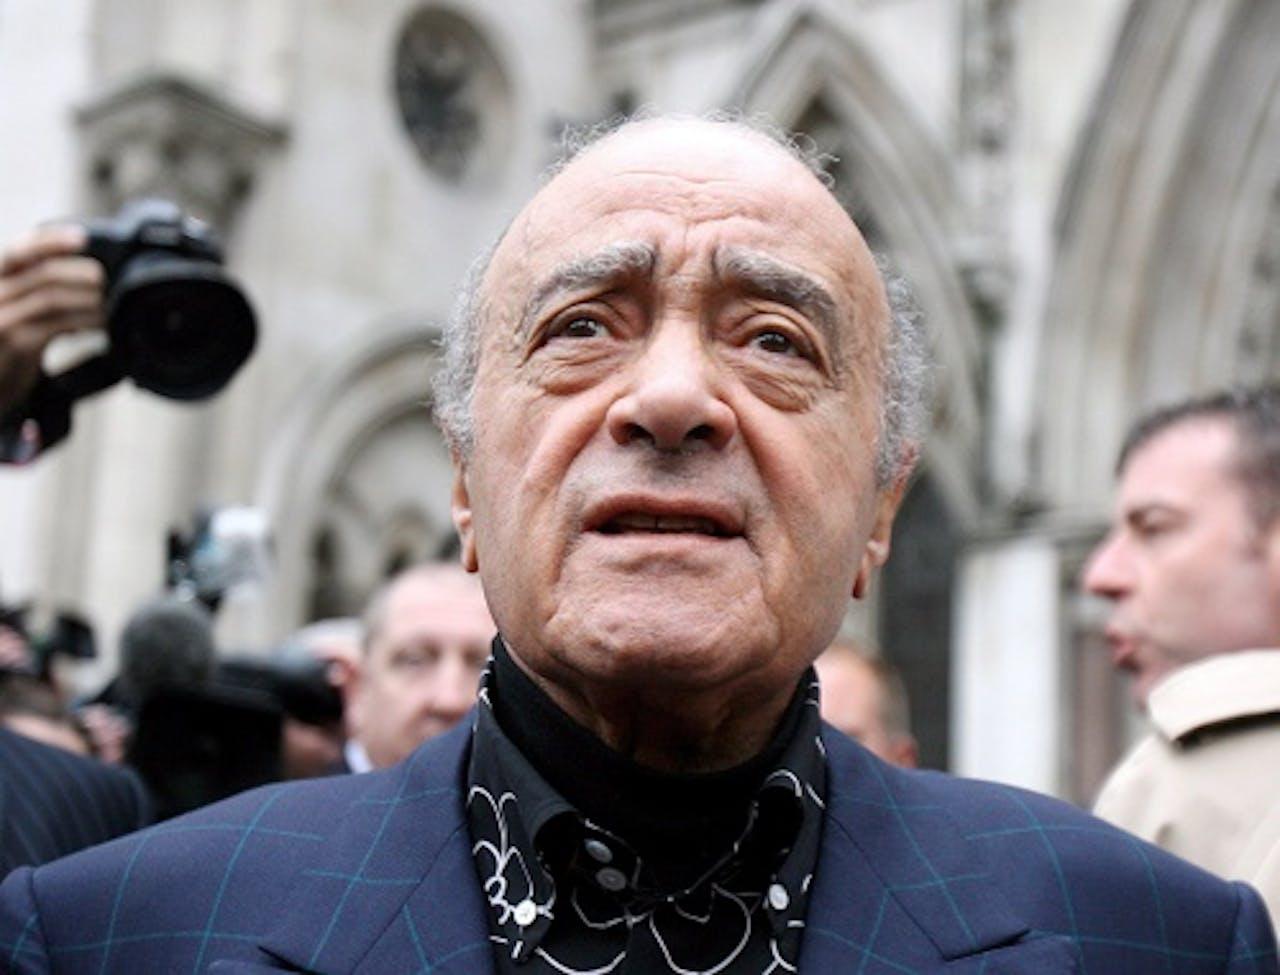 Mohamed Al Fayed op archiefbeeld. EPA